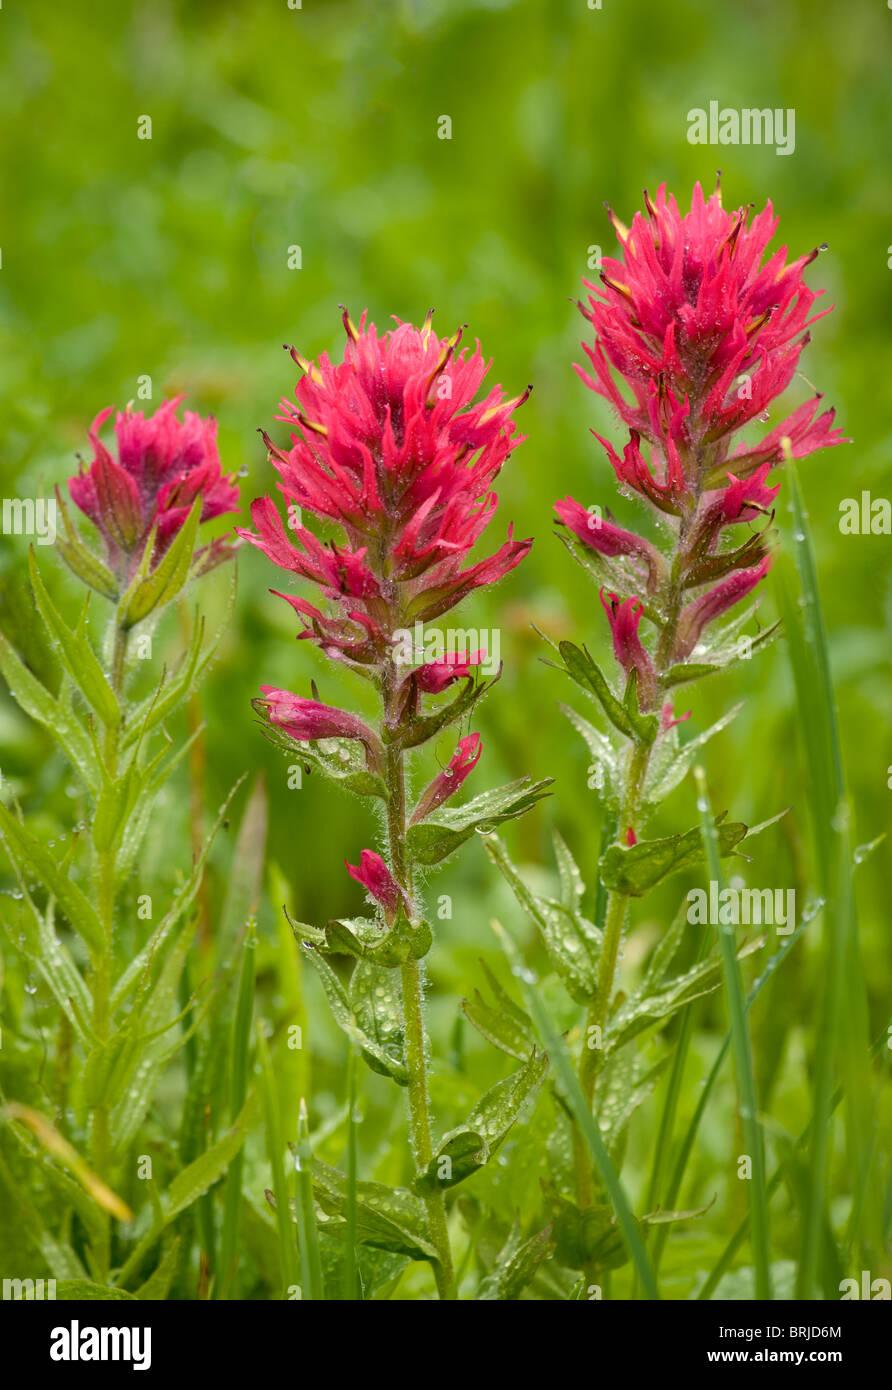 Magenta paintbrush (Castilleja parviflora); Paradise meadows, Mount Rainier National Park, Washington. - Stock Image